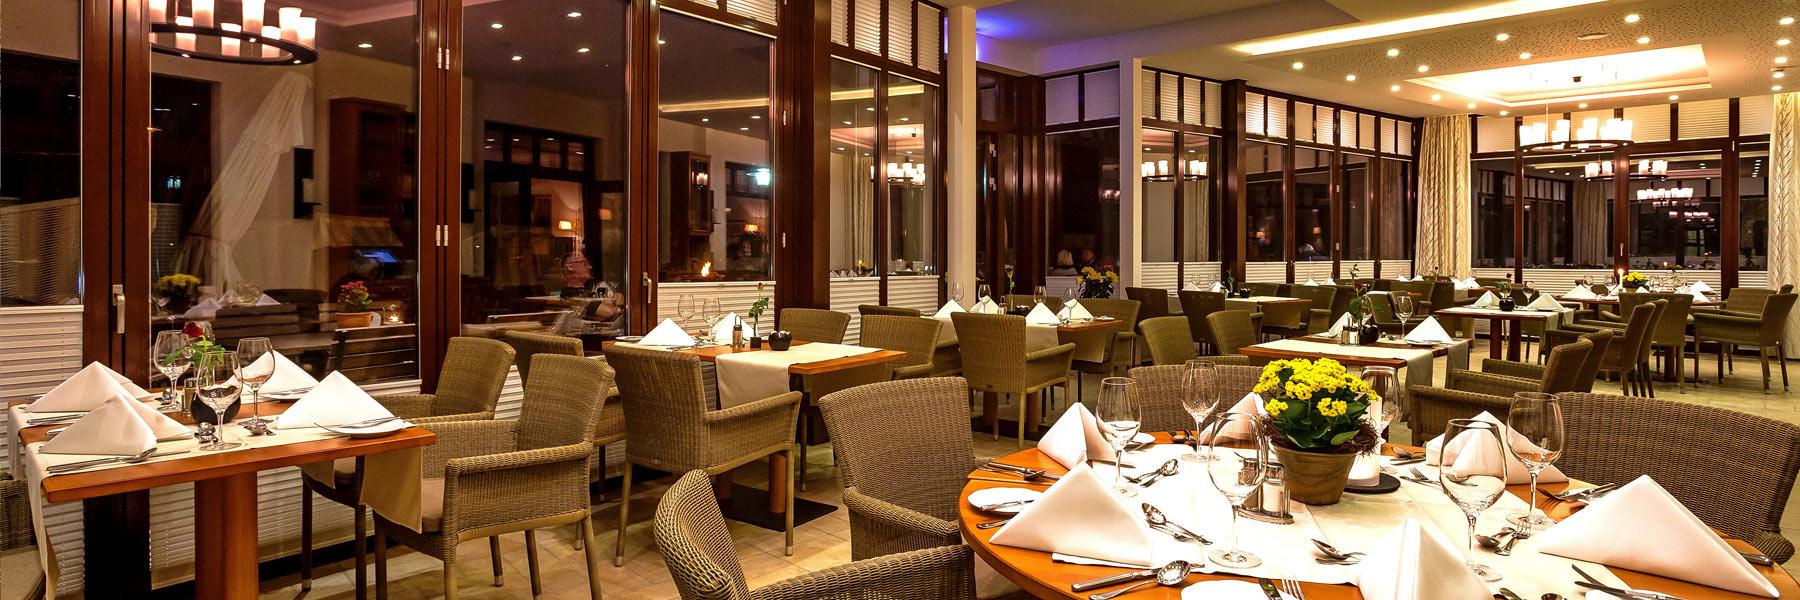 Restaurant - Hotel Warnemünder Hof